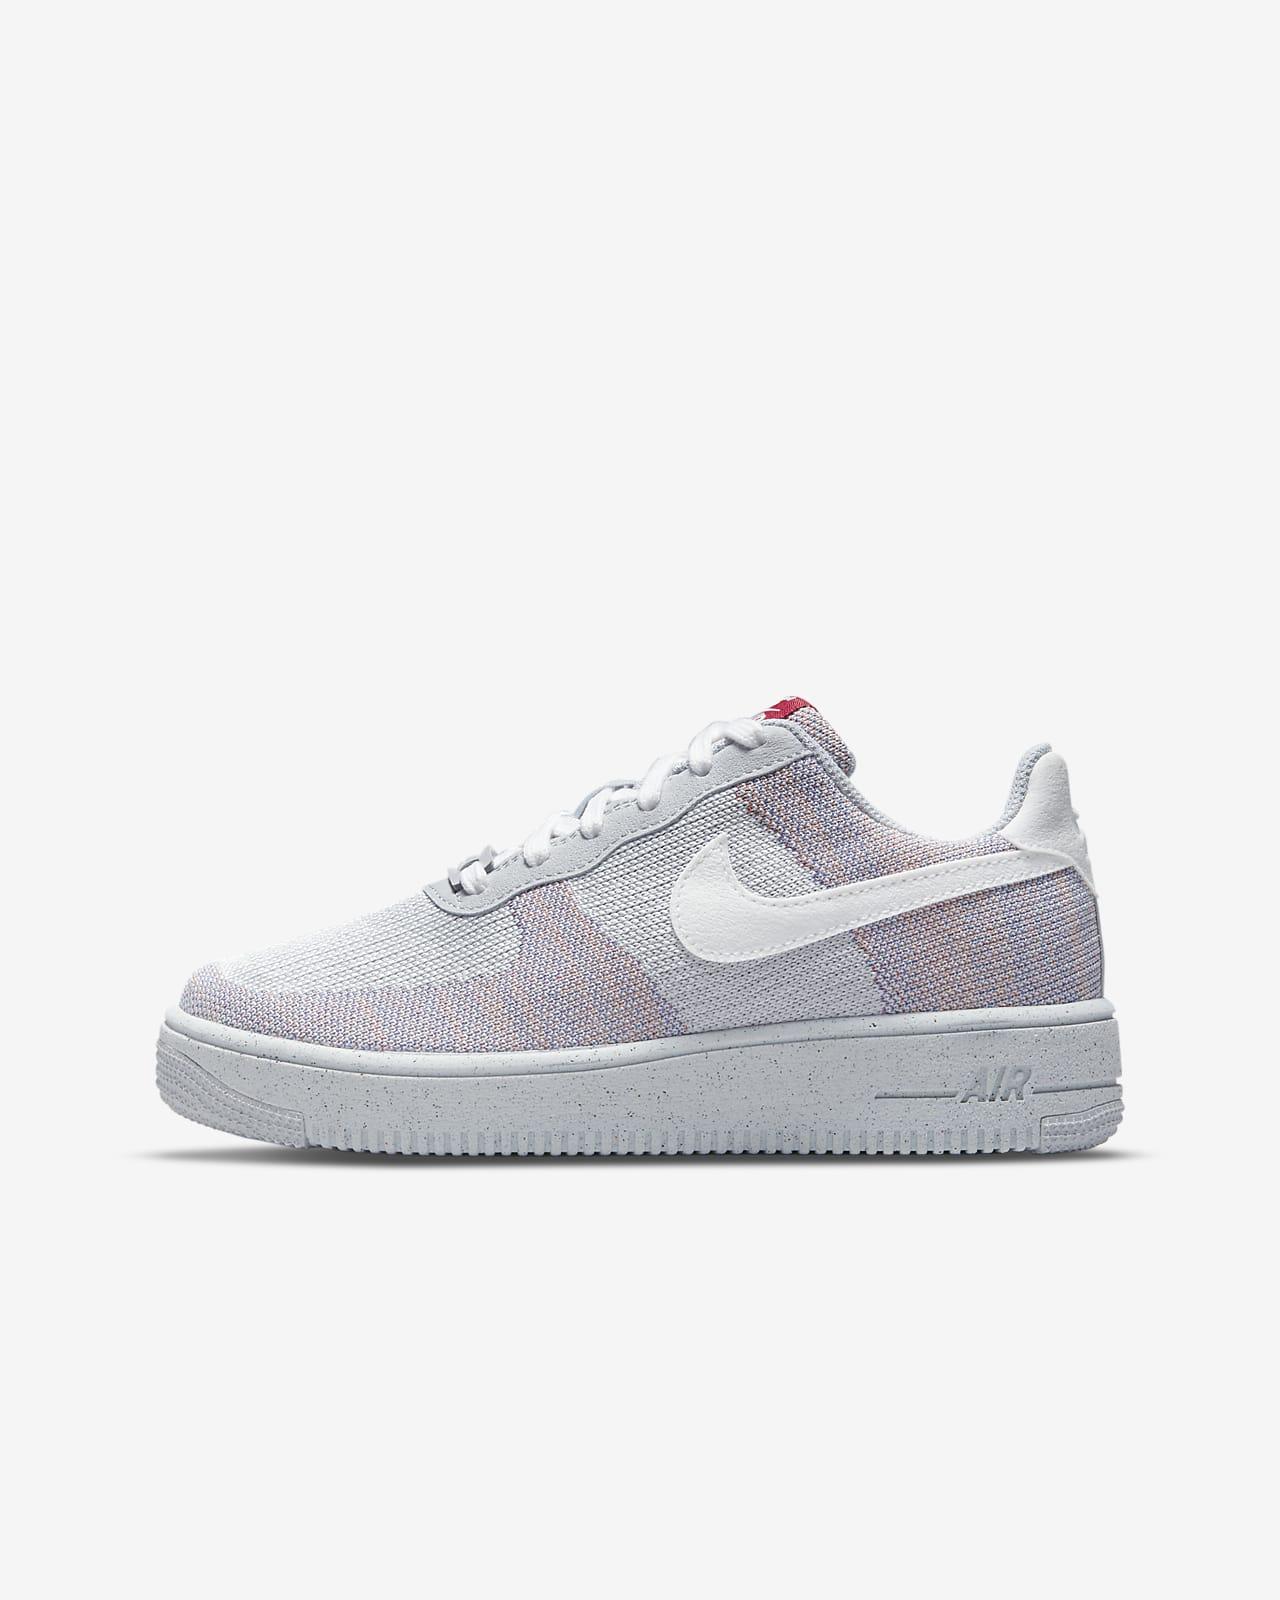 Calzado para niños talla grande Nike Air Force 1 Crater Flyknit